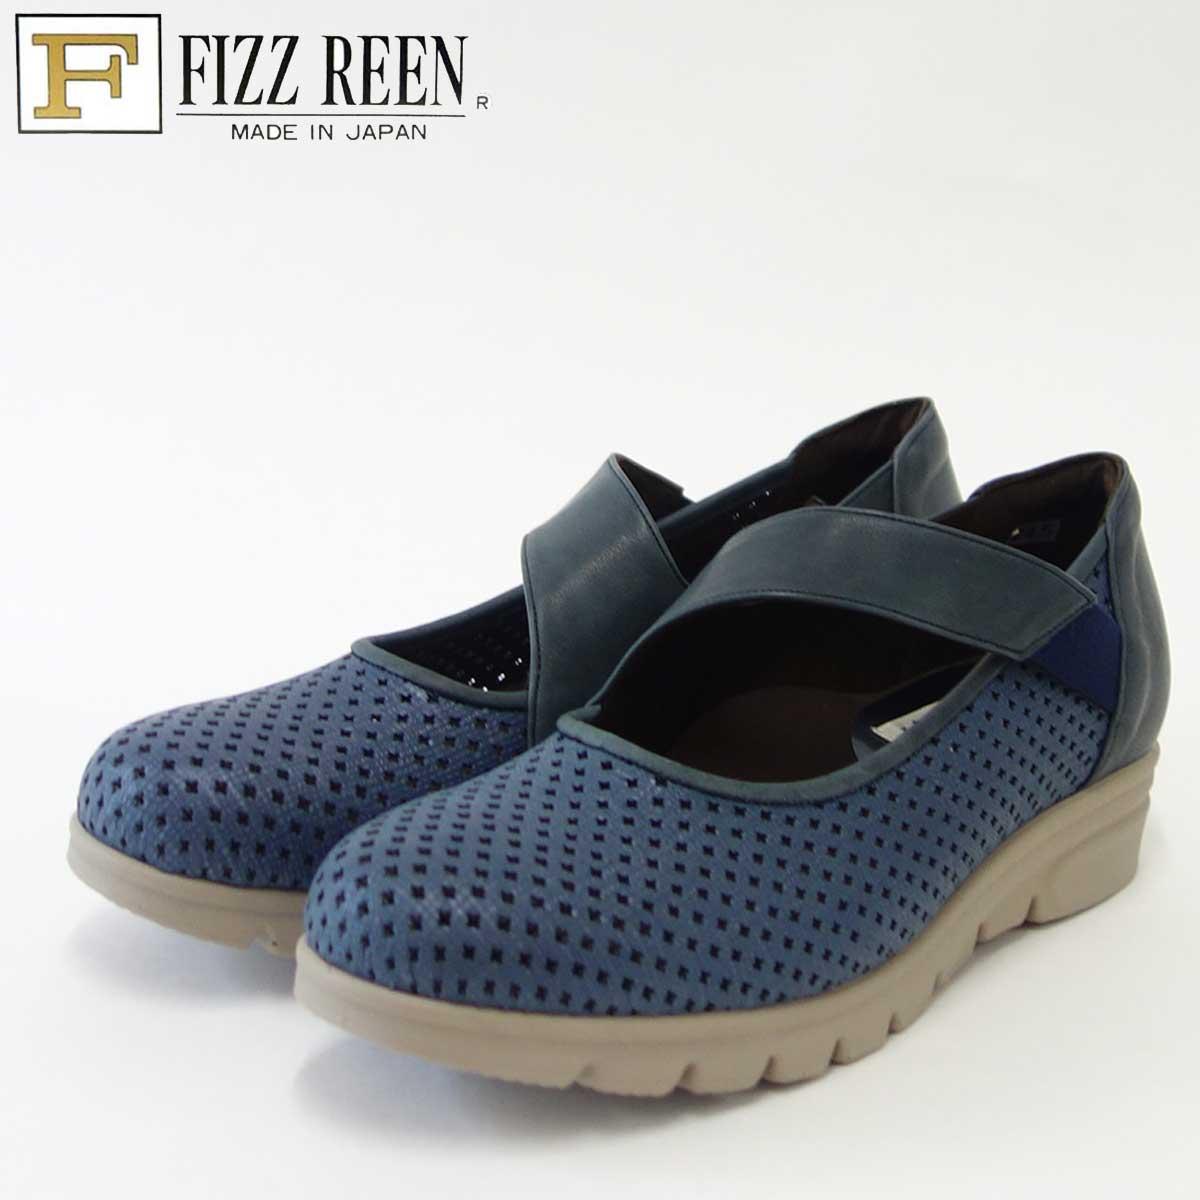 FIZZ REEN フィズリーン 20004 ネイビー(レディース)足に優しい快適EEEウェッジシューズ「靴」